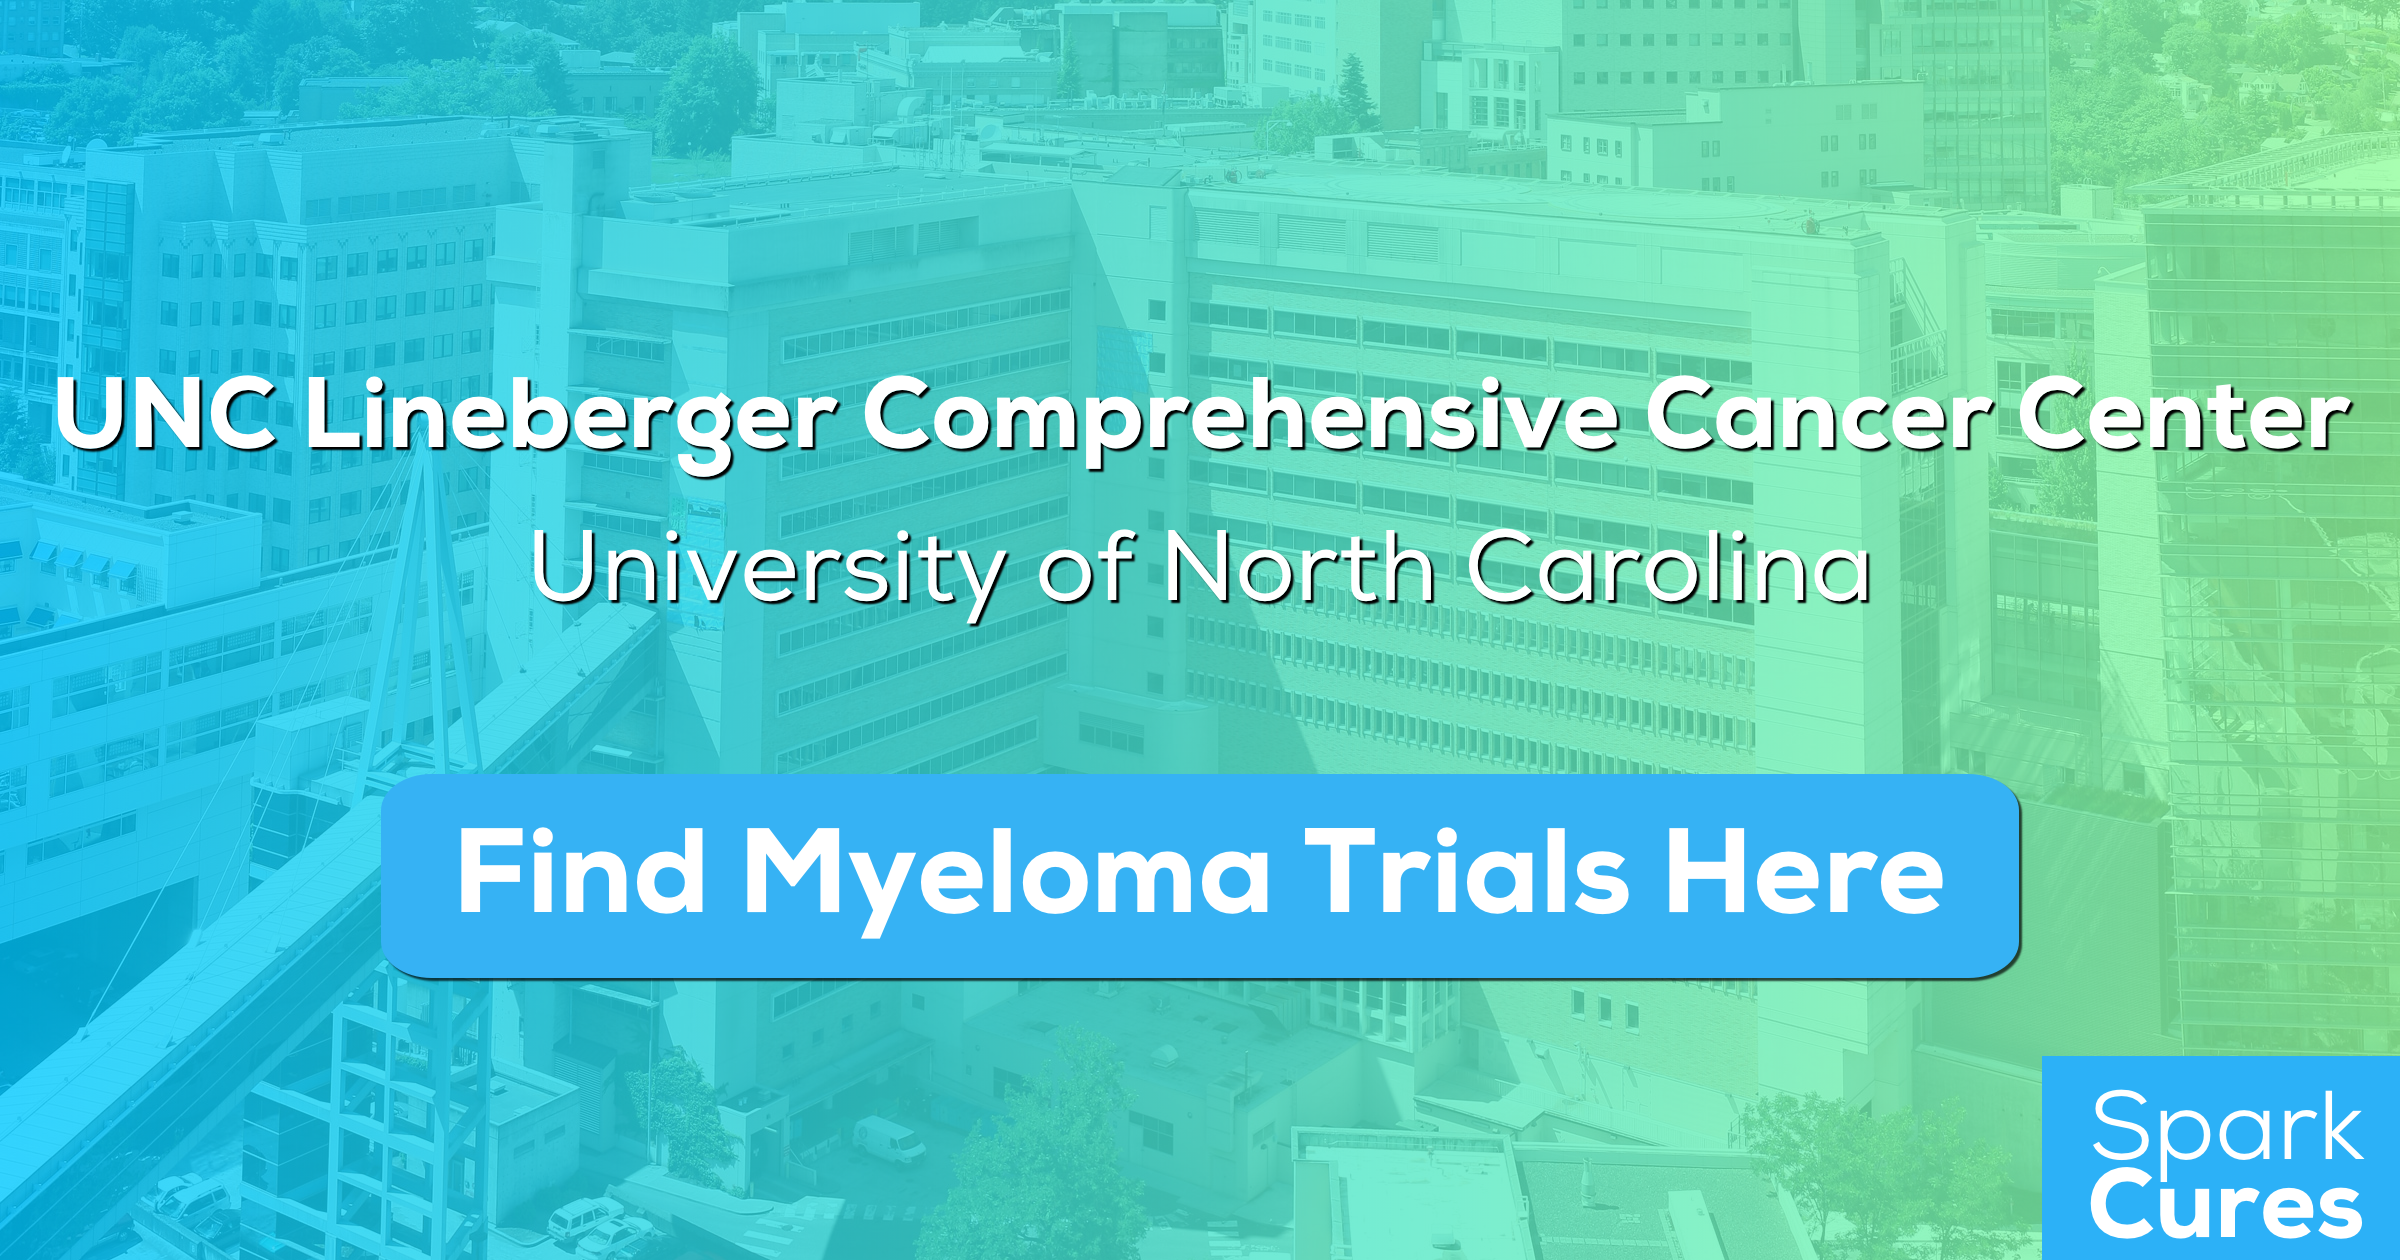 Unc Lineberger Comprehensive Cancer Center University Of